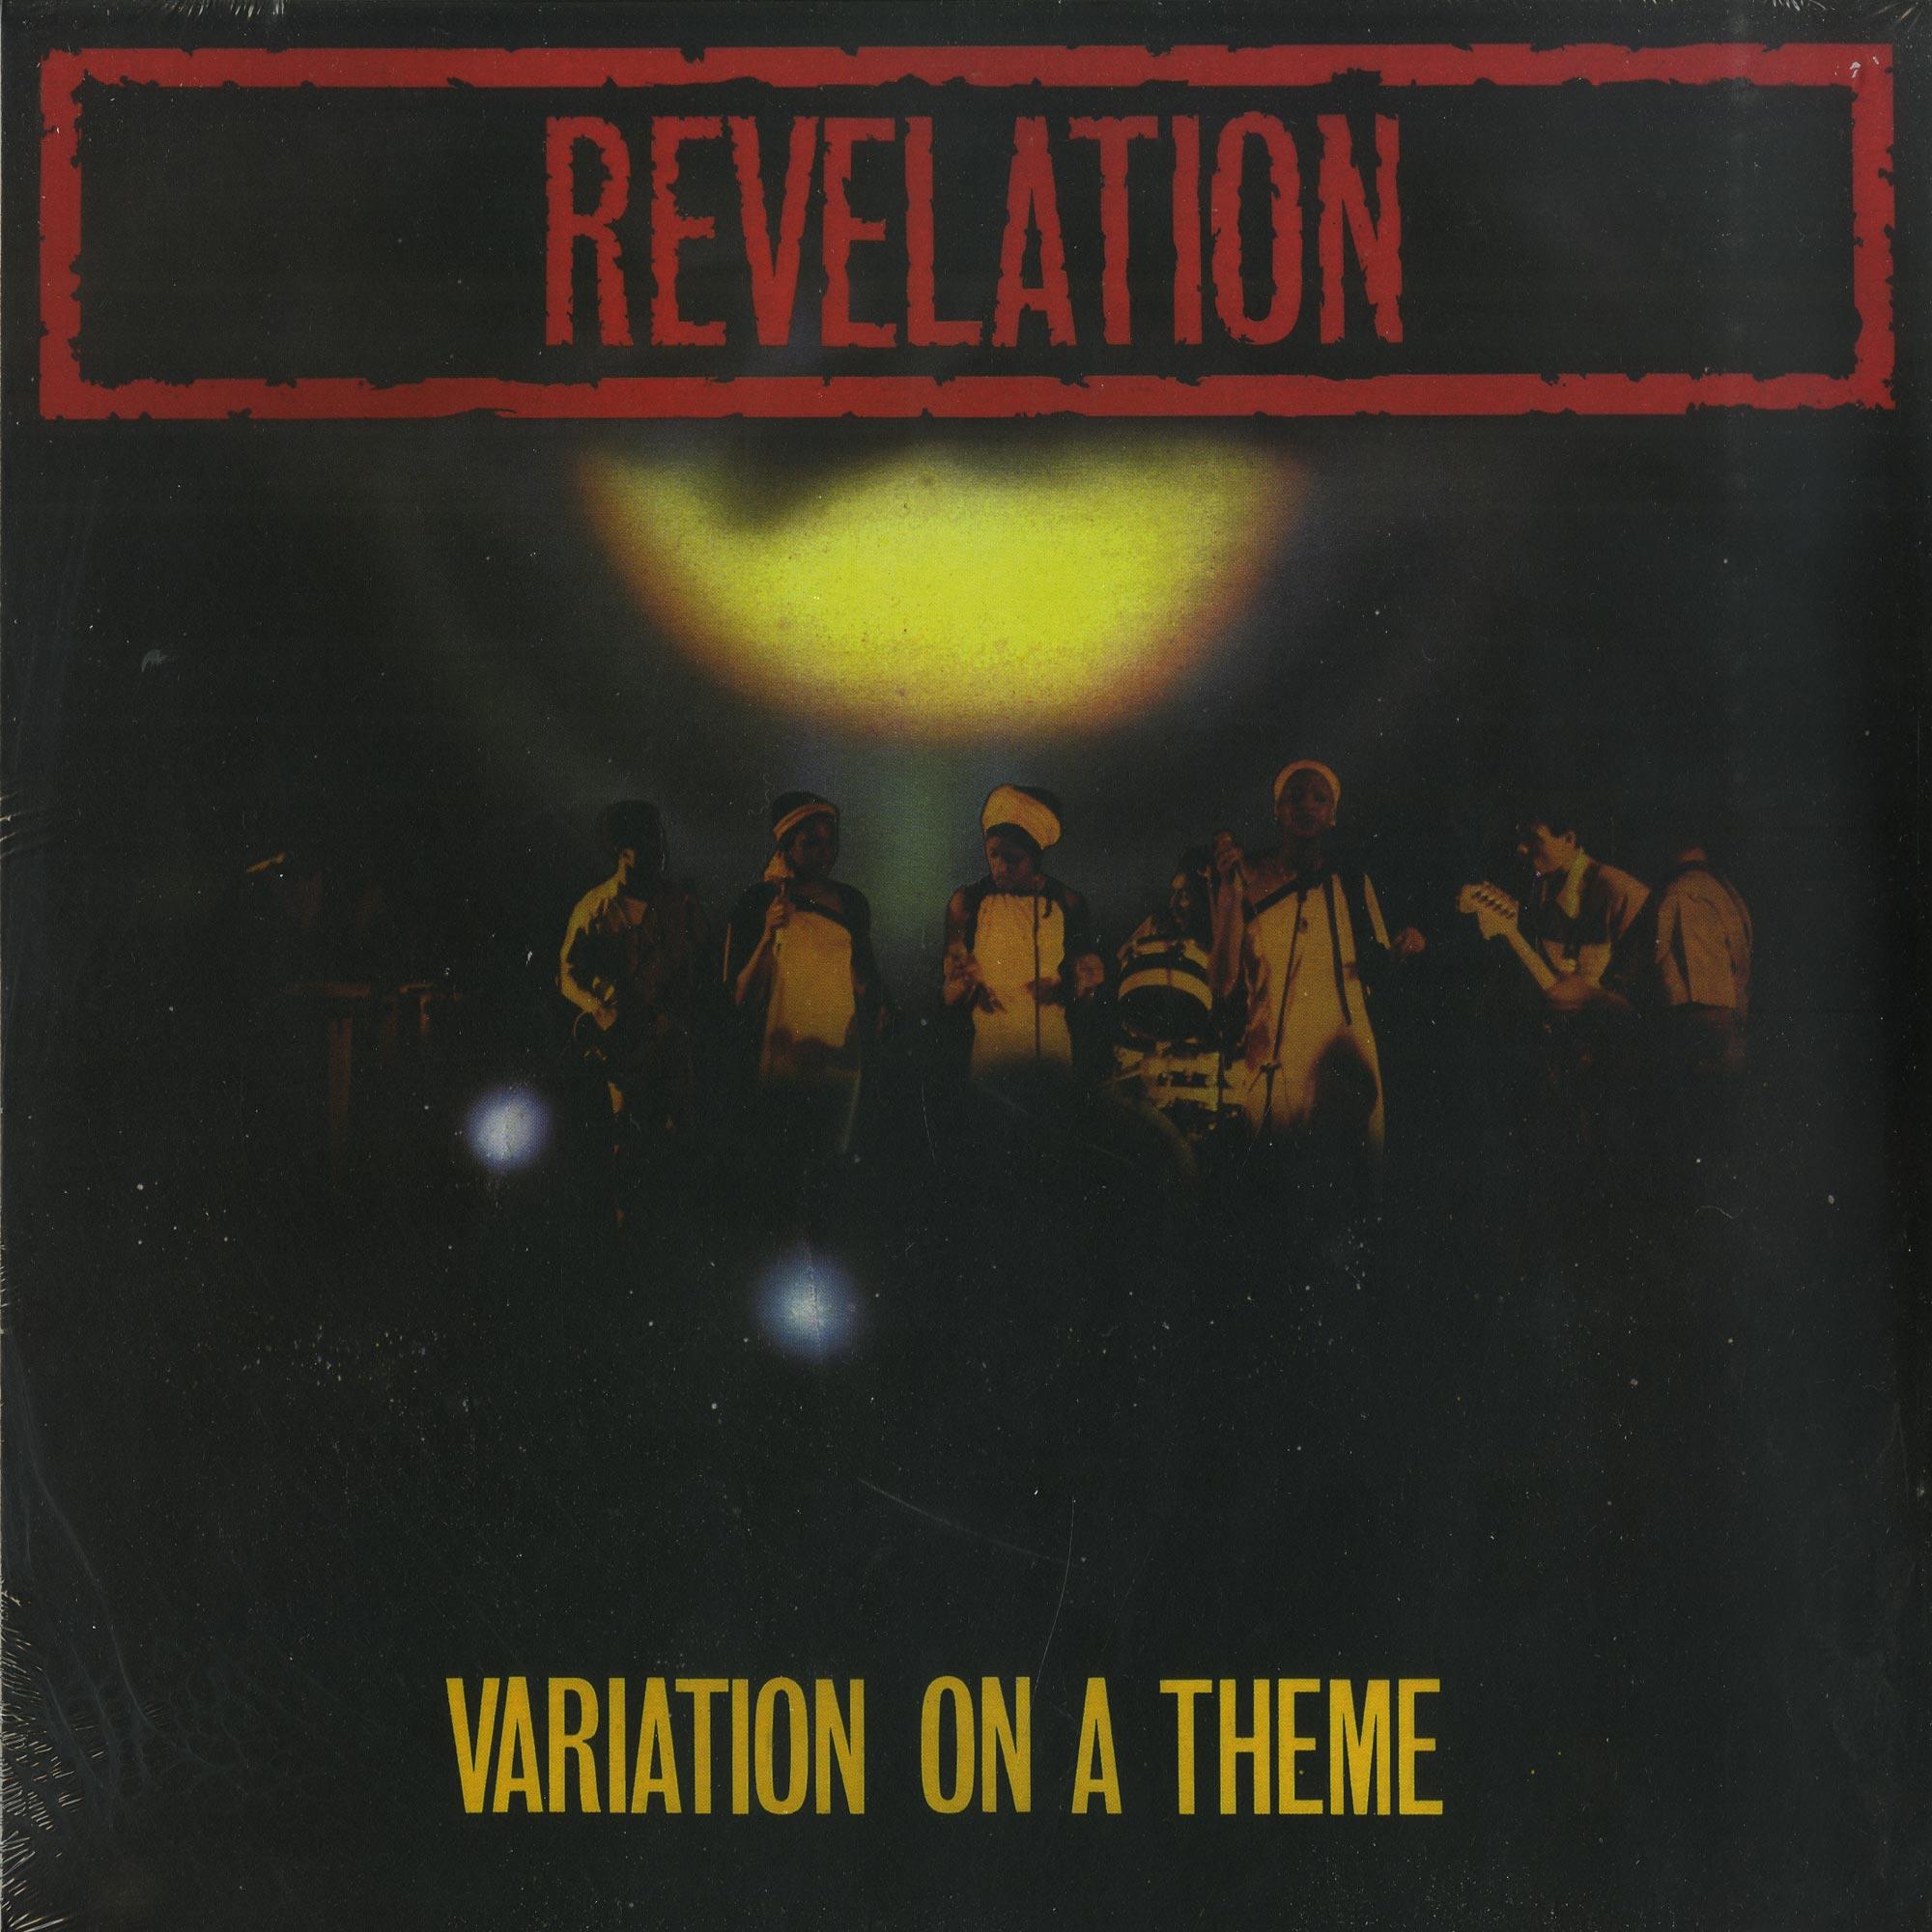 Revelation - VARIATION ON A THEME